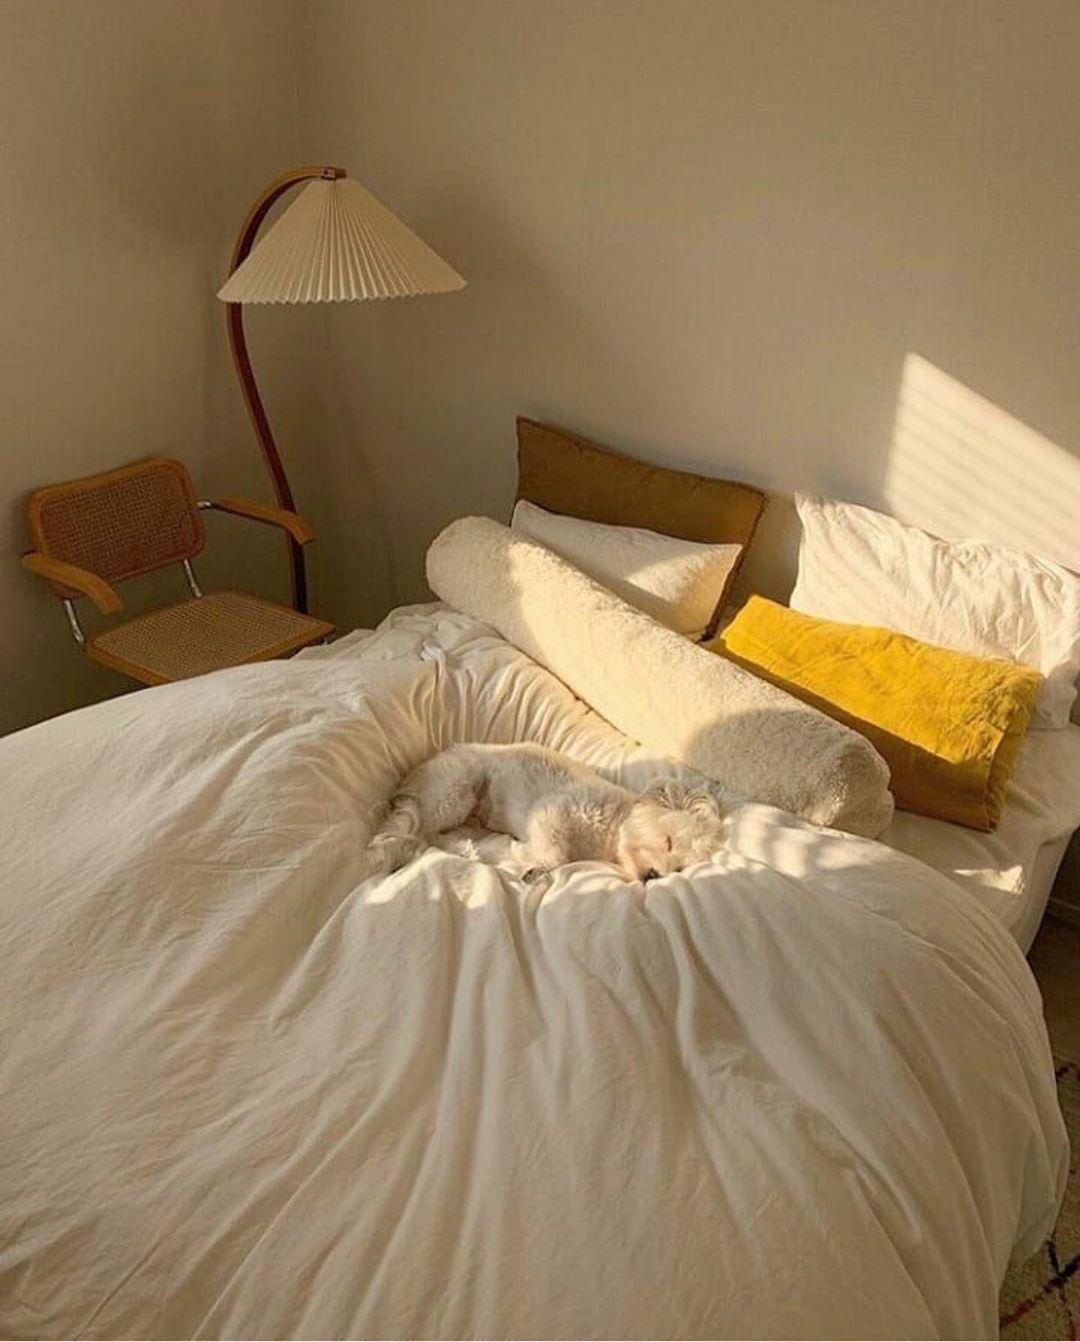 48+ Authentic room decor information